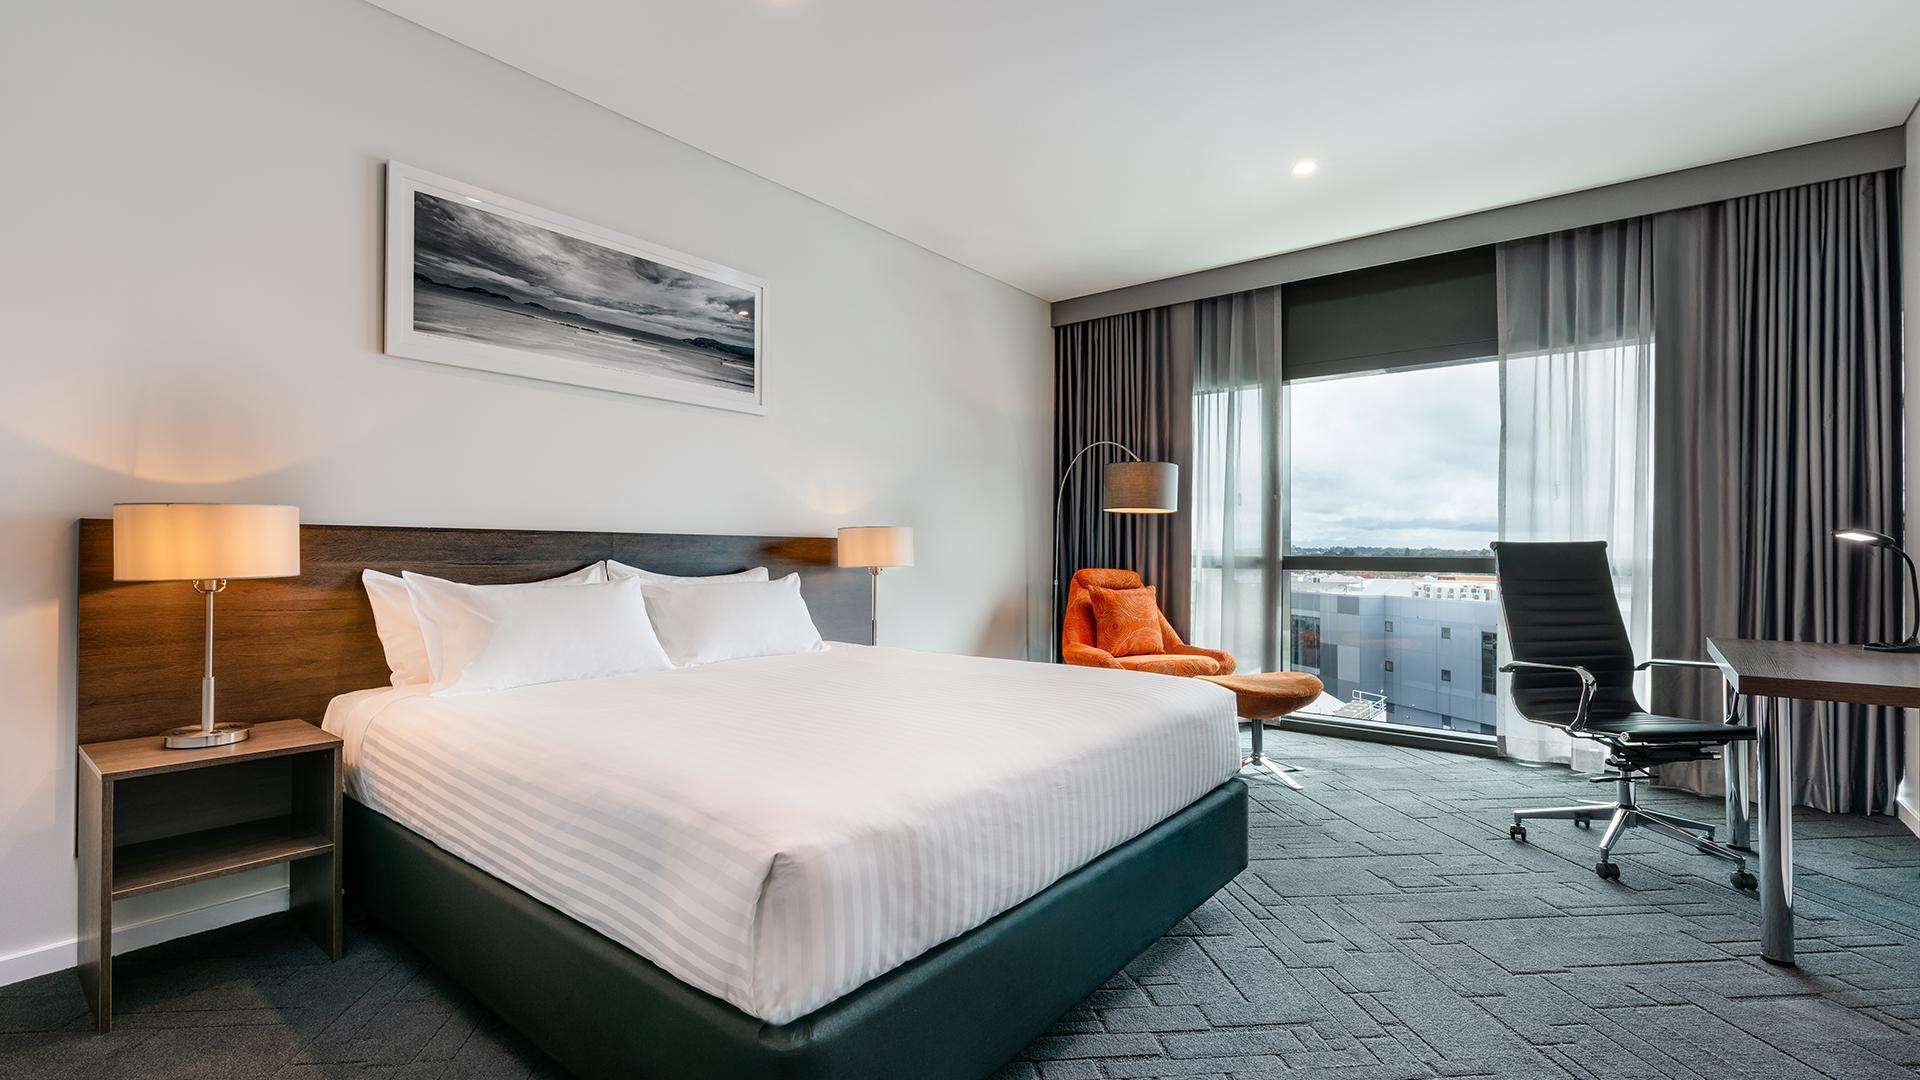 Premier King Room  image 1 at Vibe Hotel Subiaco Perth by City of Subiaco, Western Australia, Australia